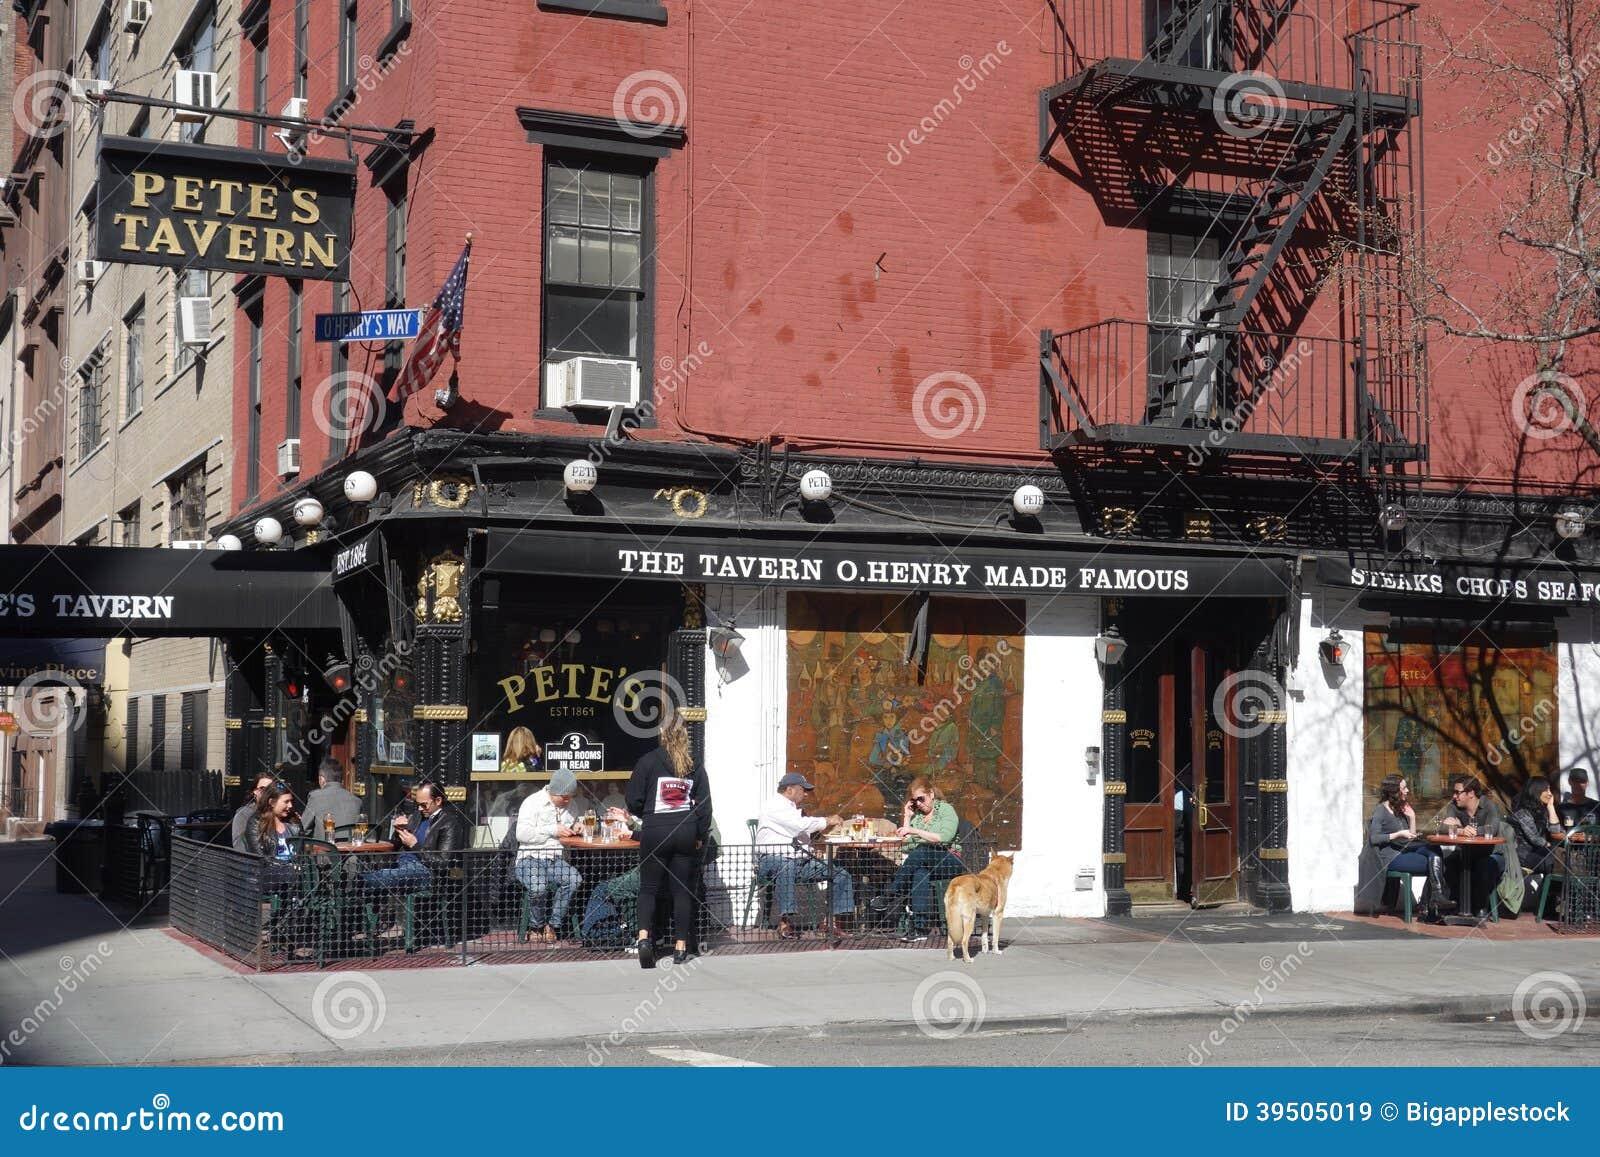 Pete s Tavern